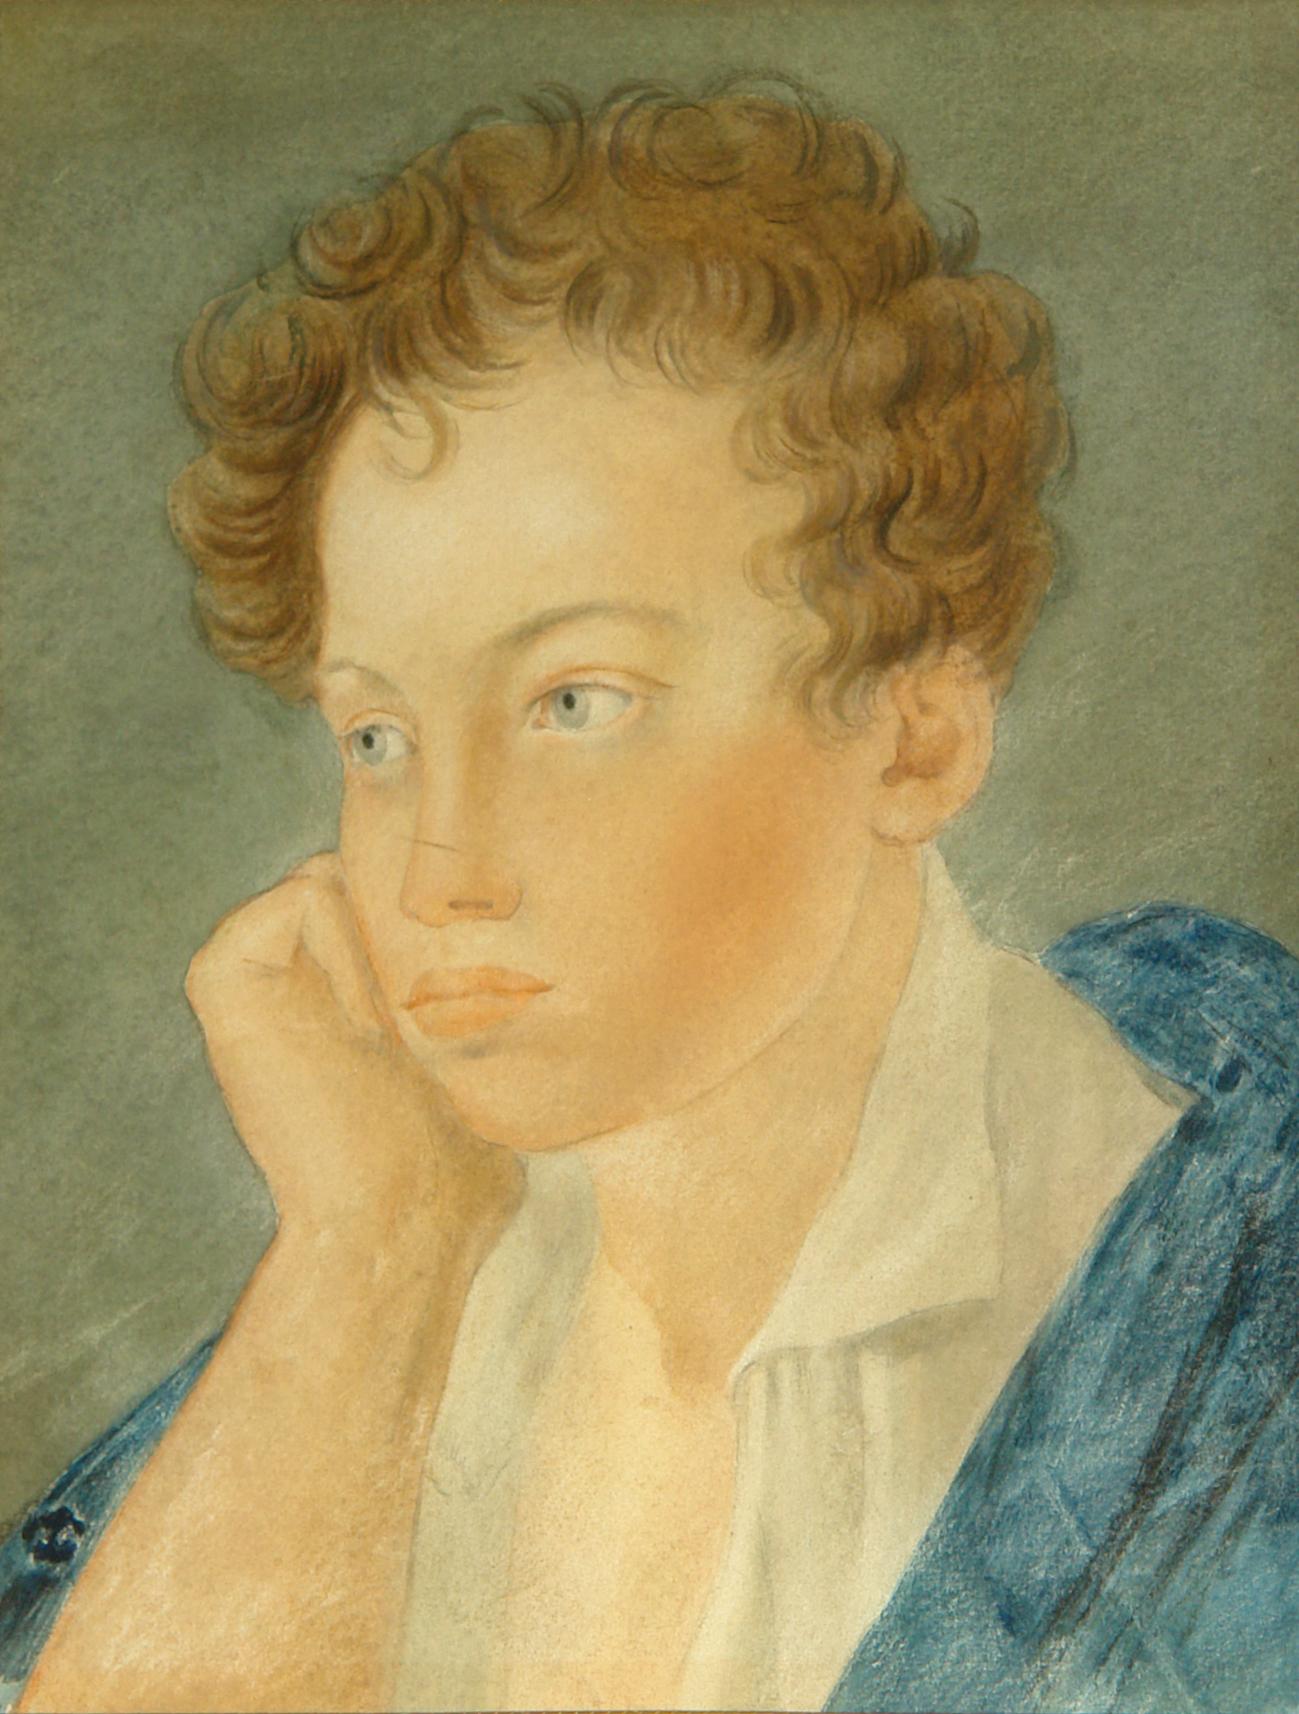 С. Г. Чириков - Александр Сергеевич Пушкин (акварель).jpg